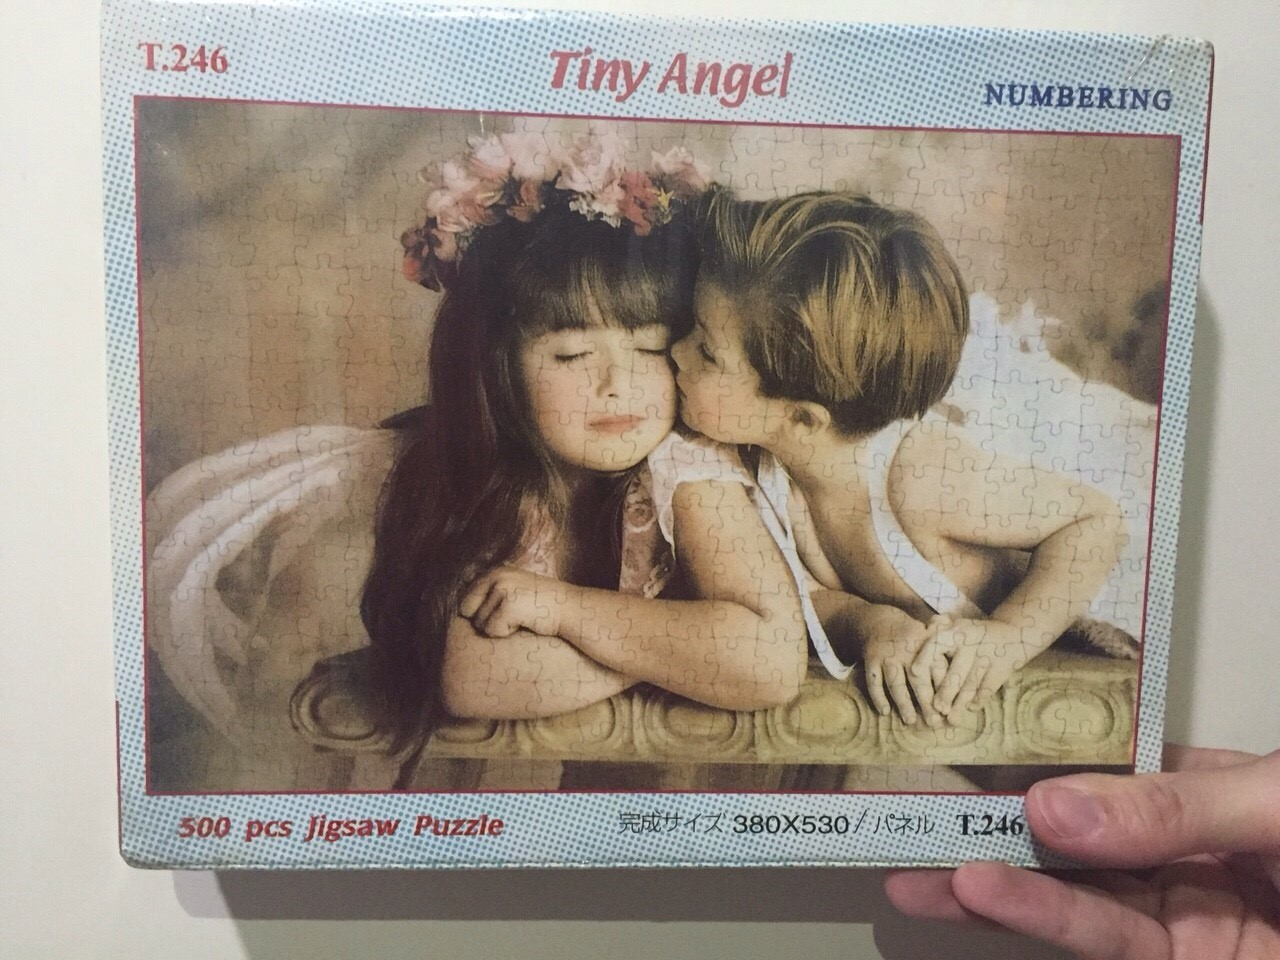 Cute 500 Pcs. Jigsaw Puzzle Size 380*350 mm.